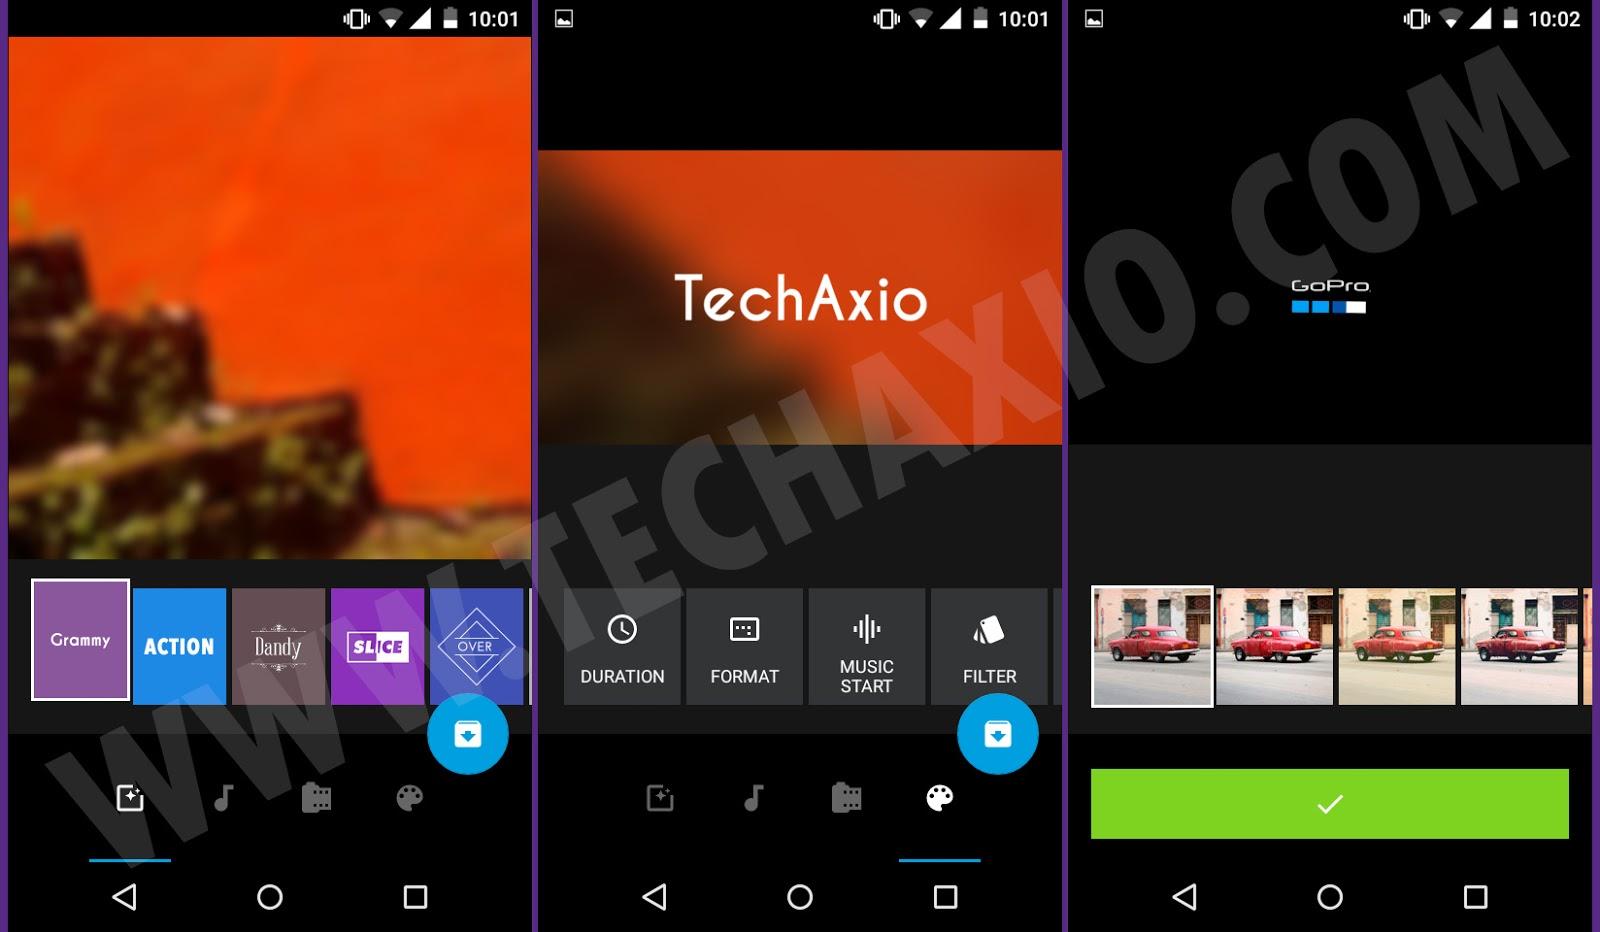 Quik - Free Video Editor Screenshot